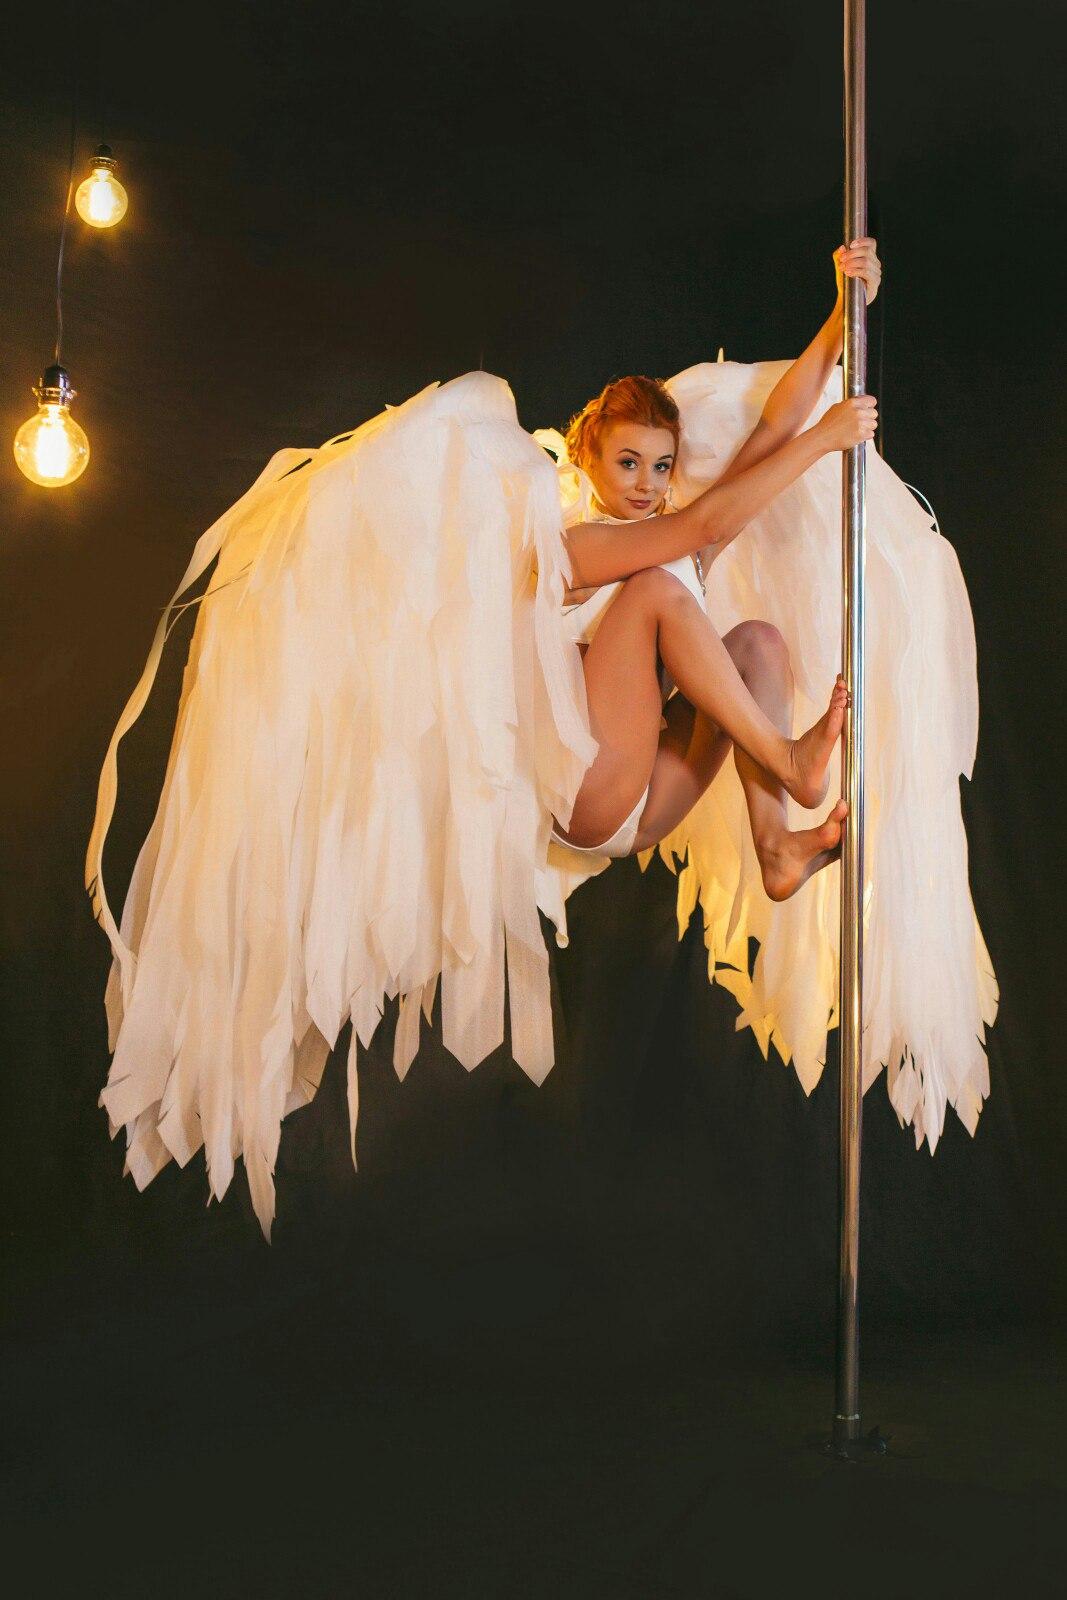 Юлия Розе -тренер pole dance, pole